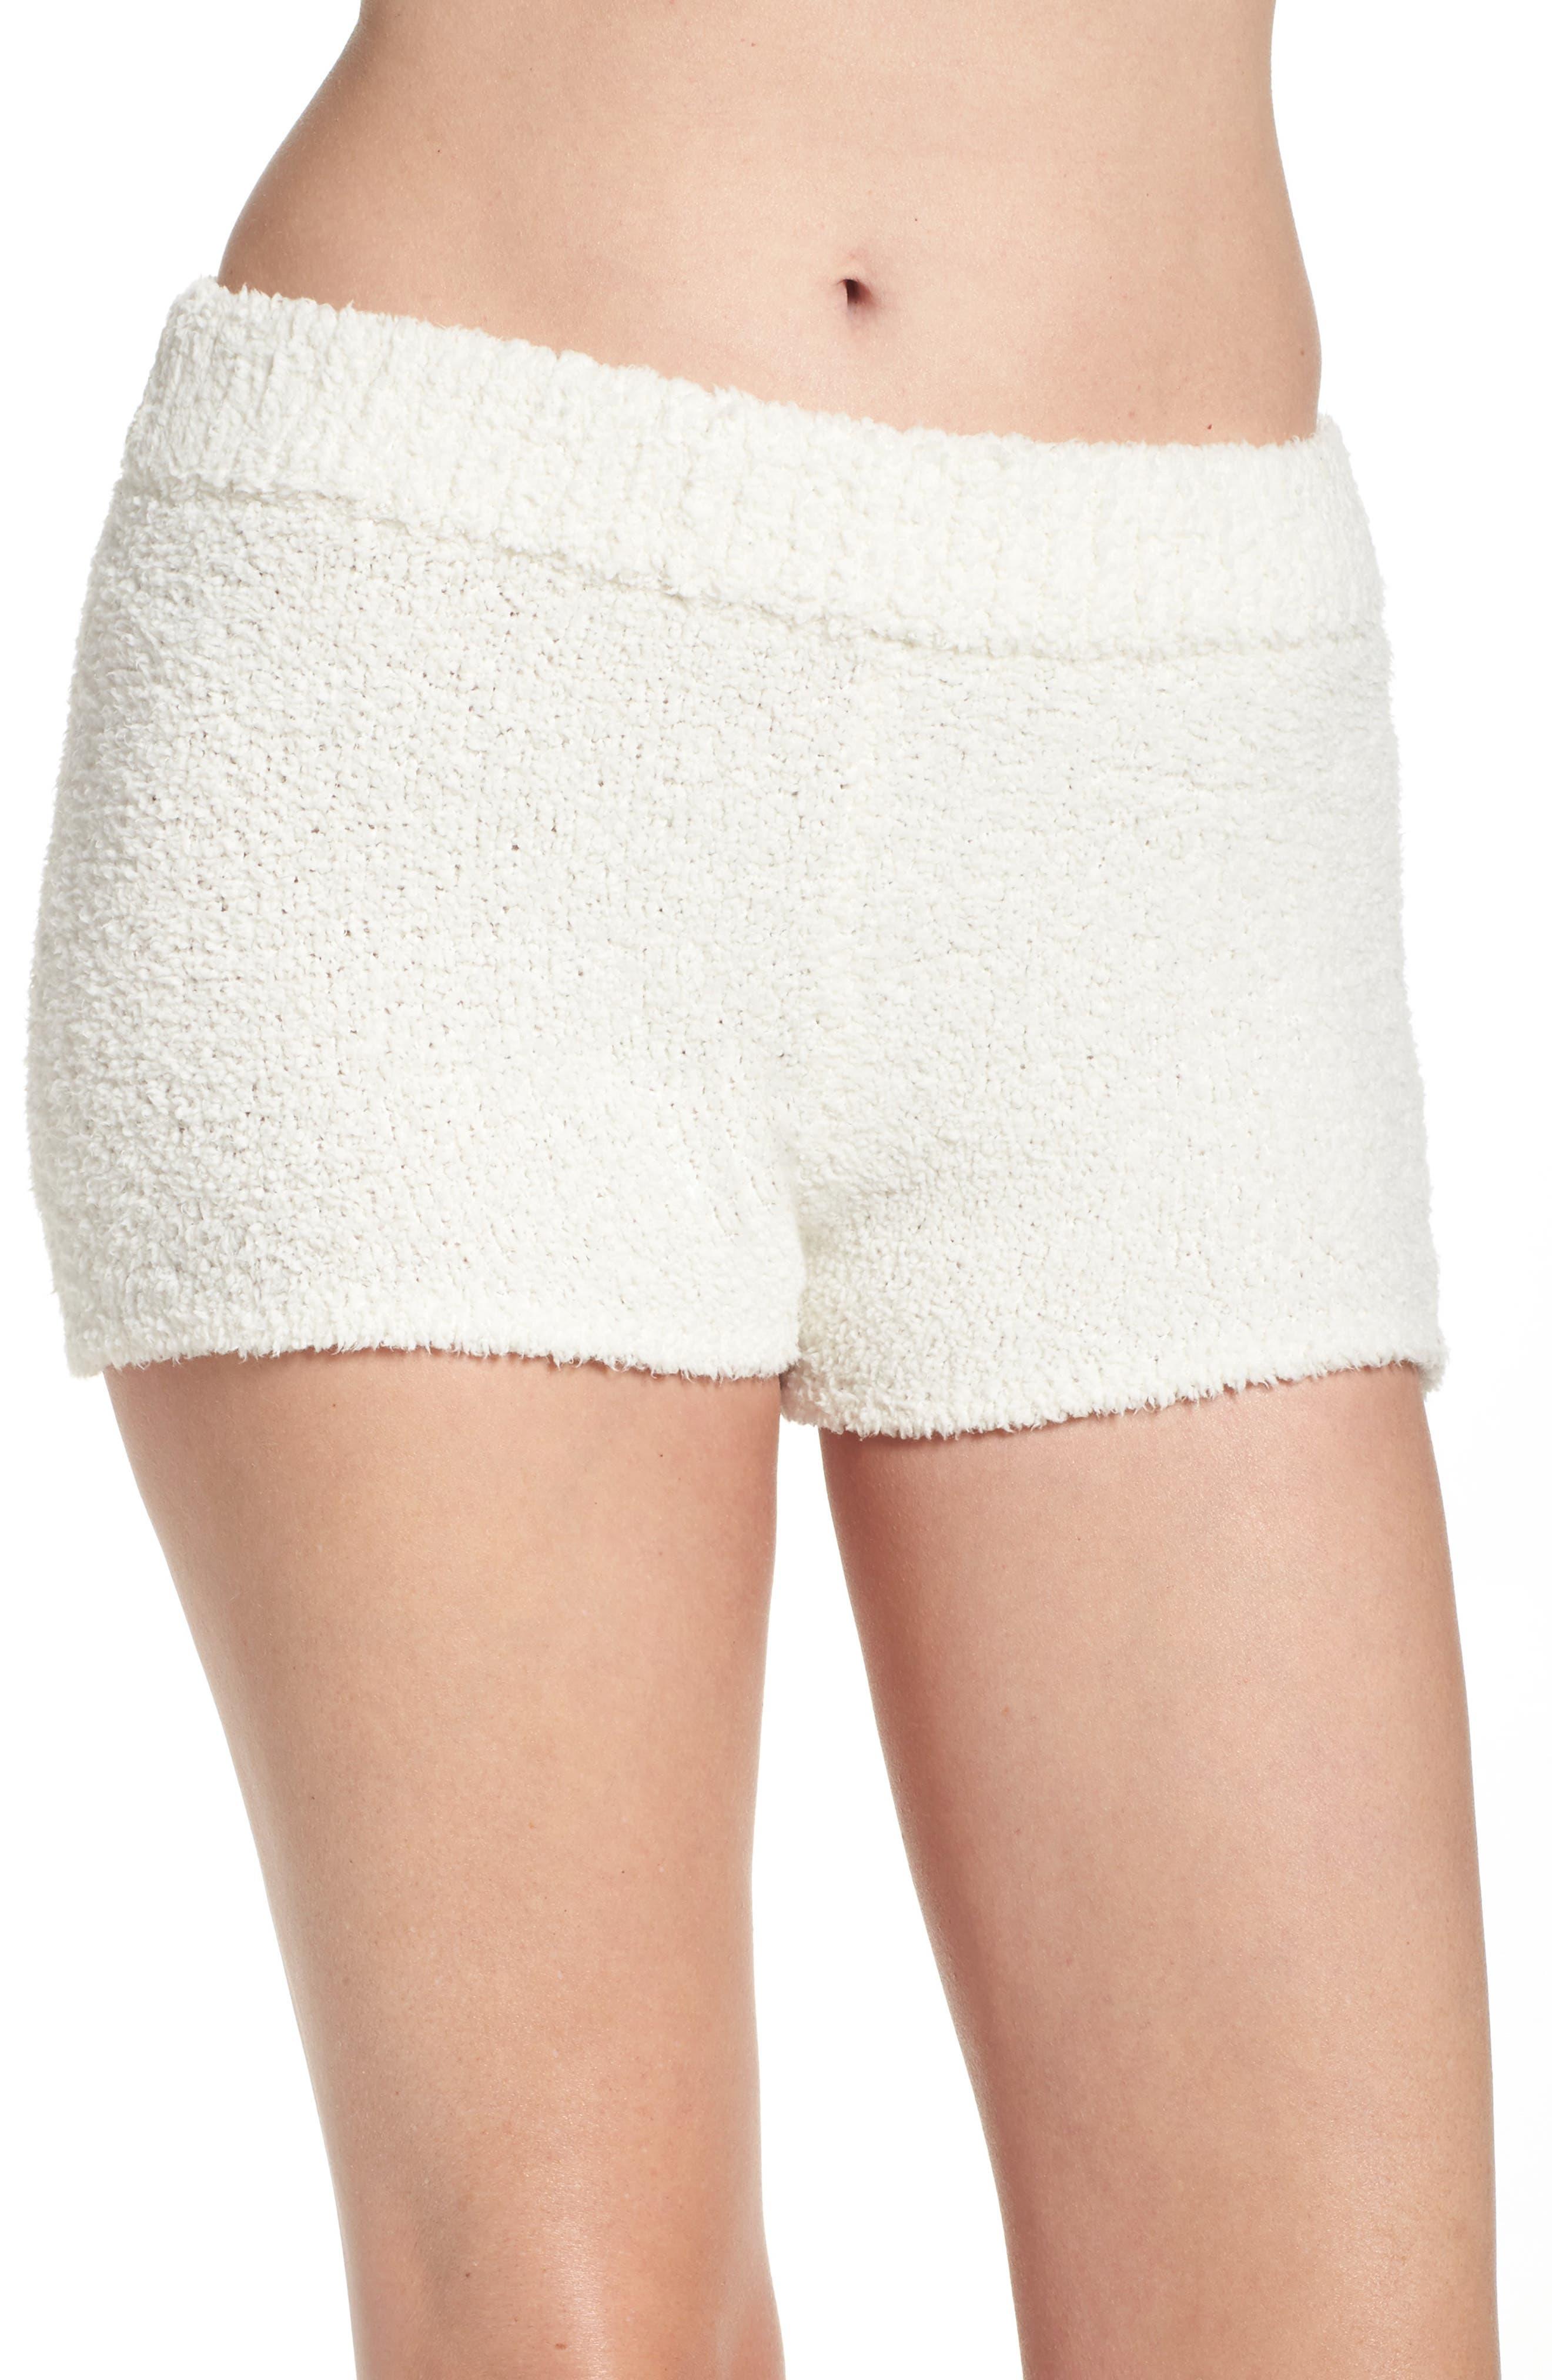 Sweater Knit Pajama Shorts,                         Main,                         color, Cream